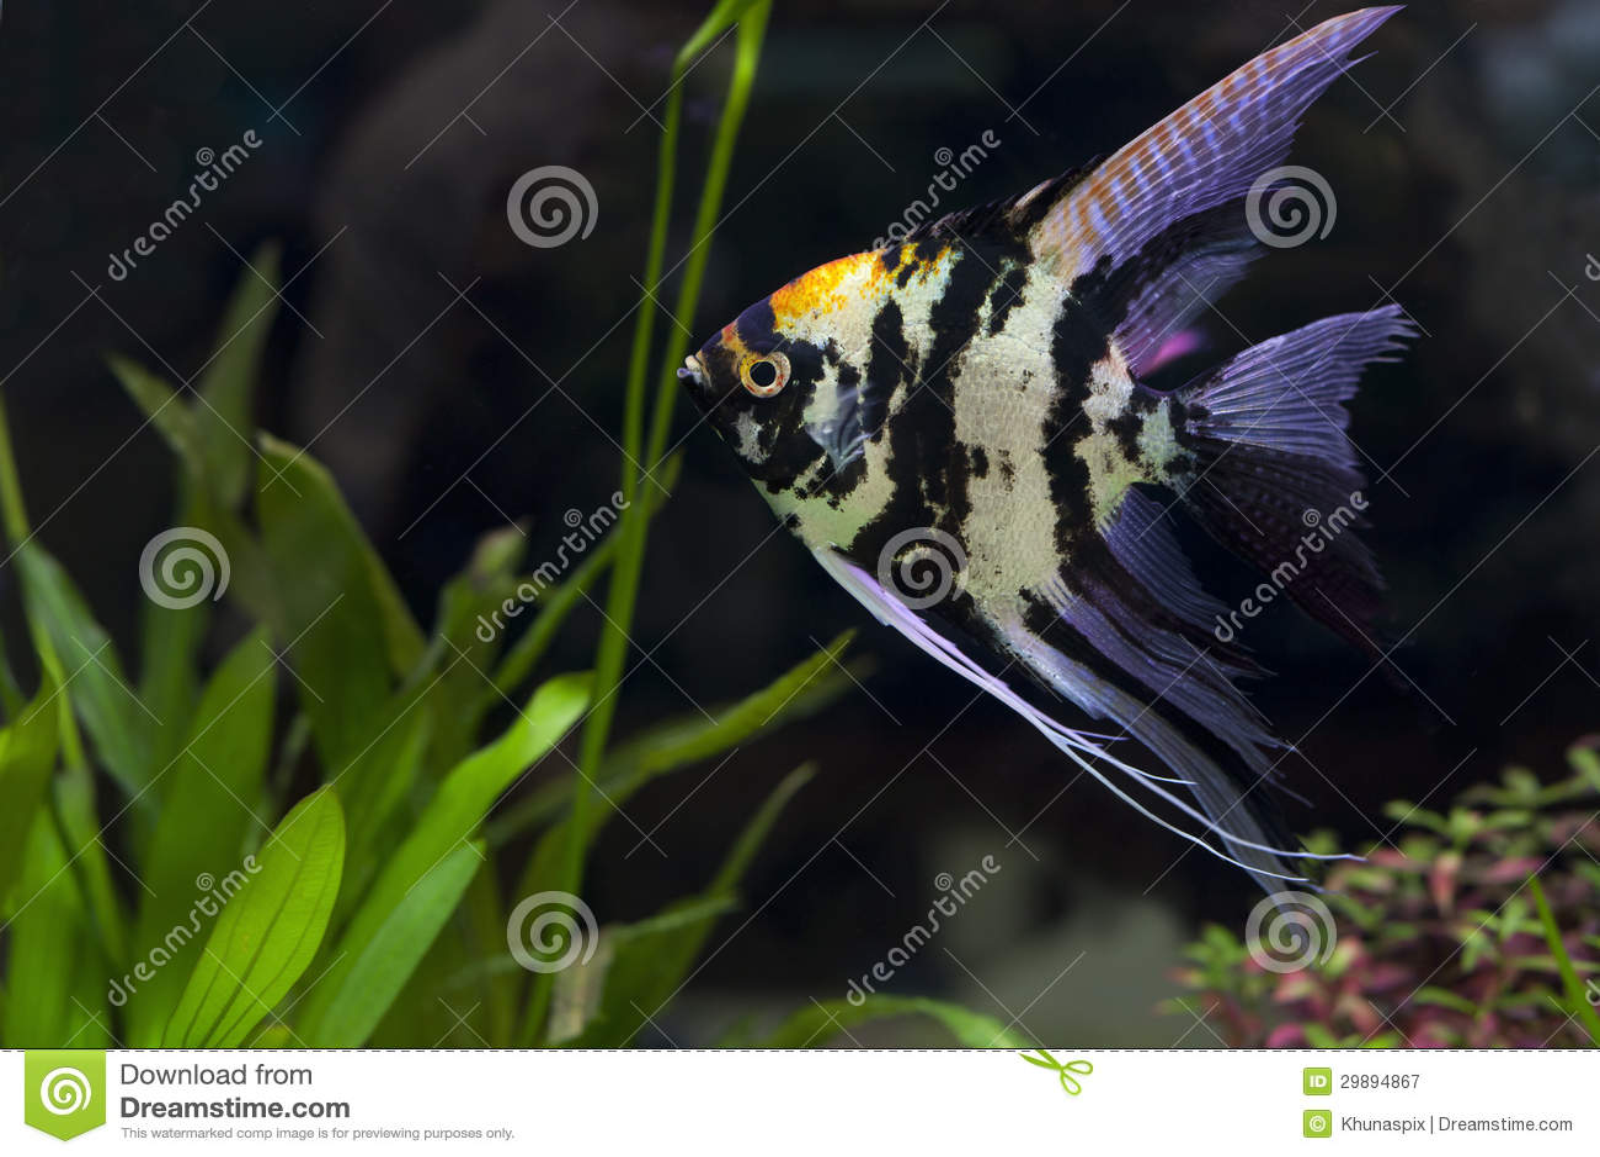 Angel fish in green aquarium royalty free stock for Aquarium angle